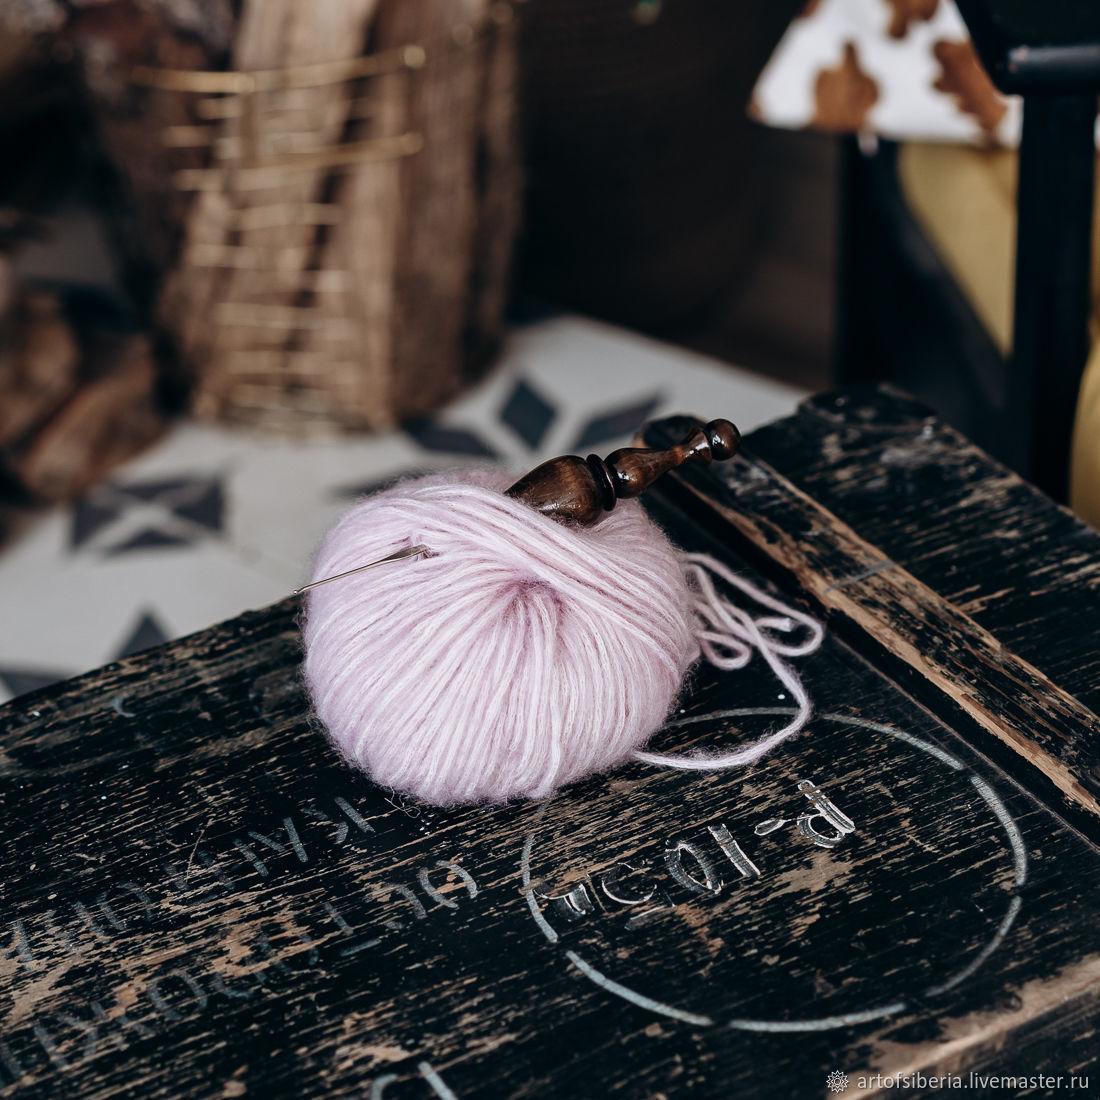 1,0 mm iron crochet hook with wooden handle (cedar) K217, Crochet Hooks, Novokuznetsk,  Фото №1